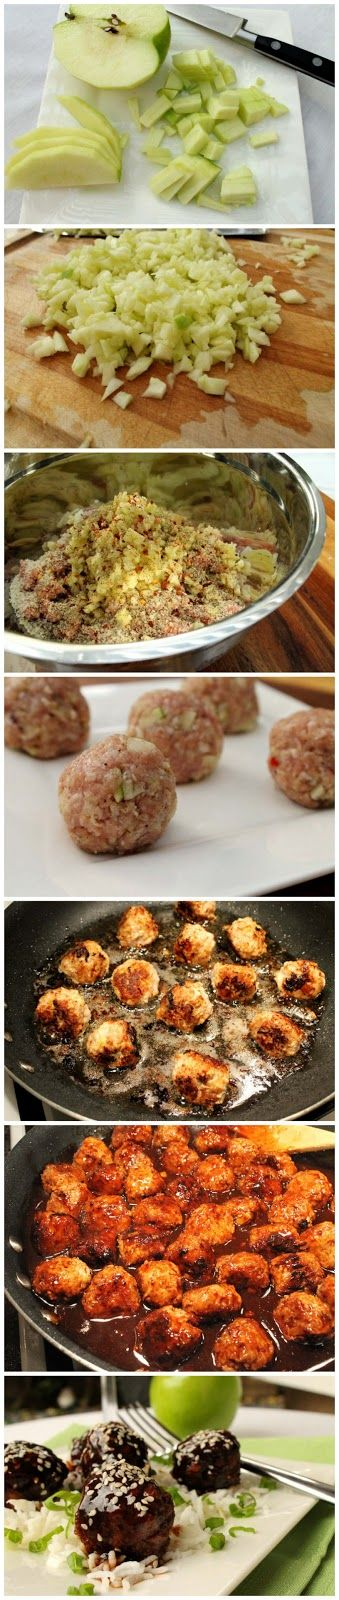 Apple Meatballs in Wine Sauce Recipe - Ian's gf Panko